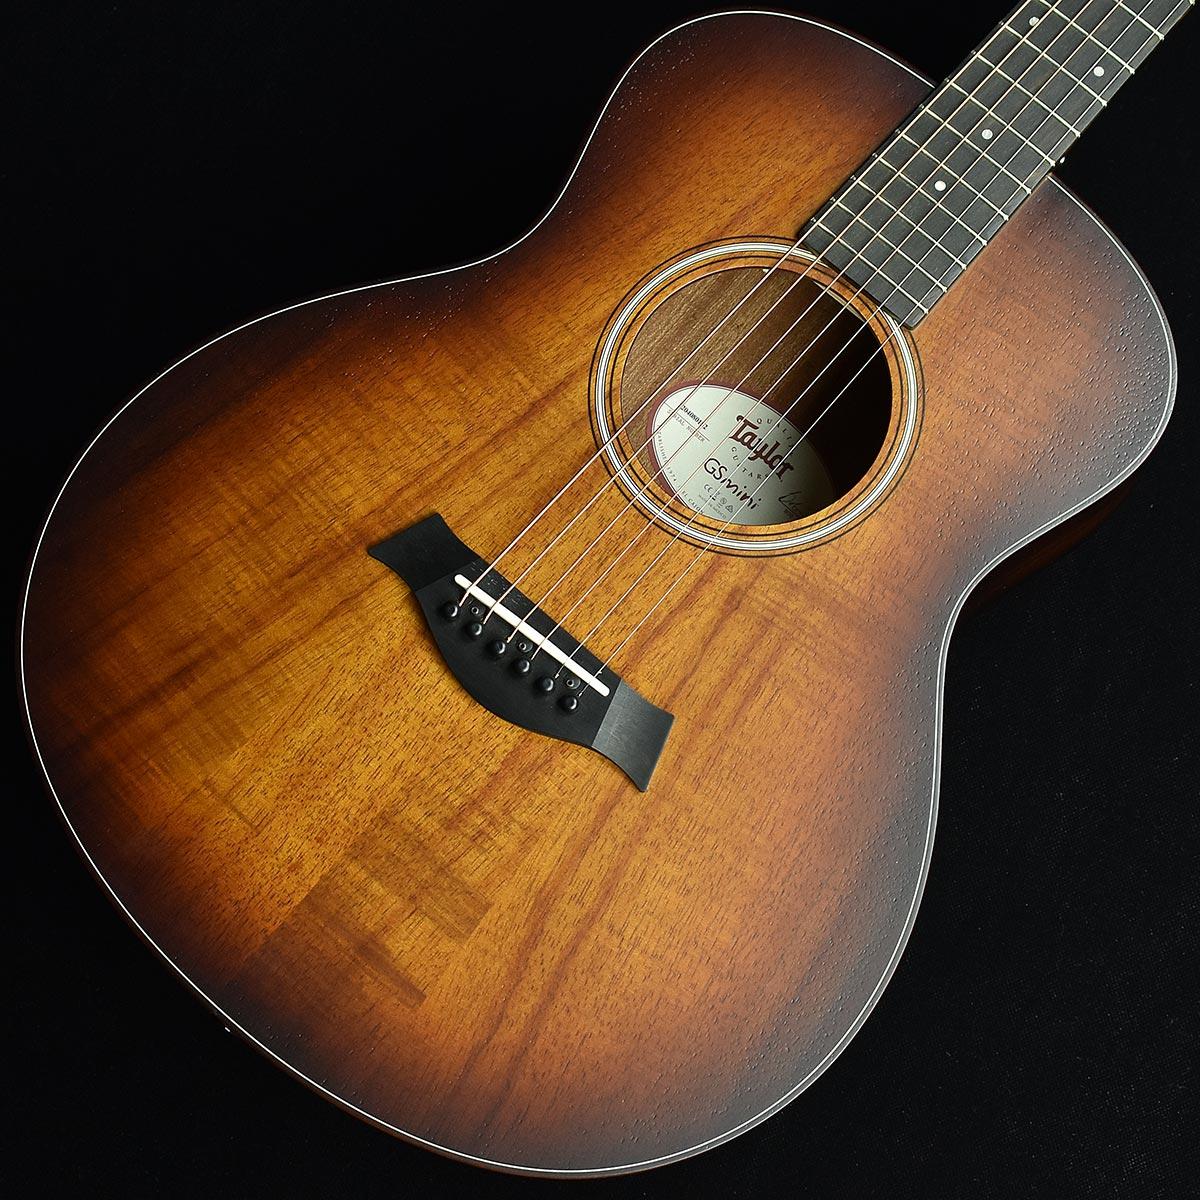 Taylor GS Mini-e Koa Plus S/N:2204080152 ミニアコースティックギター【エレアコ】 【テイラー】【未展示品】